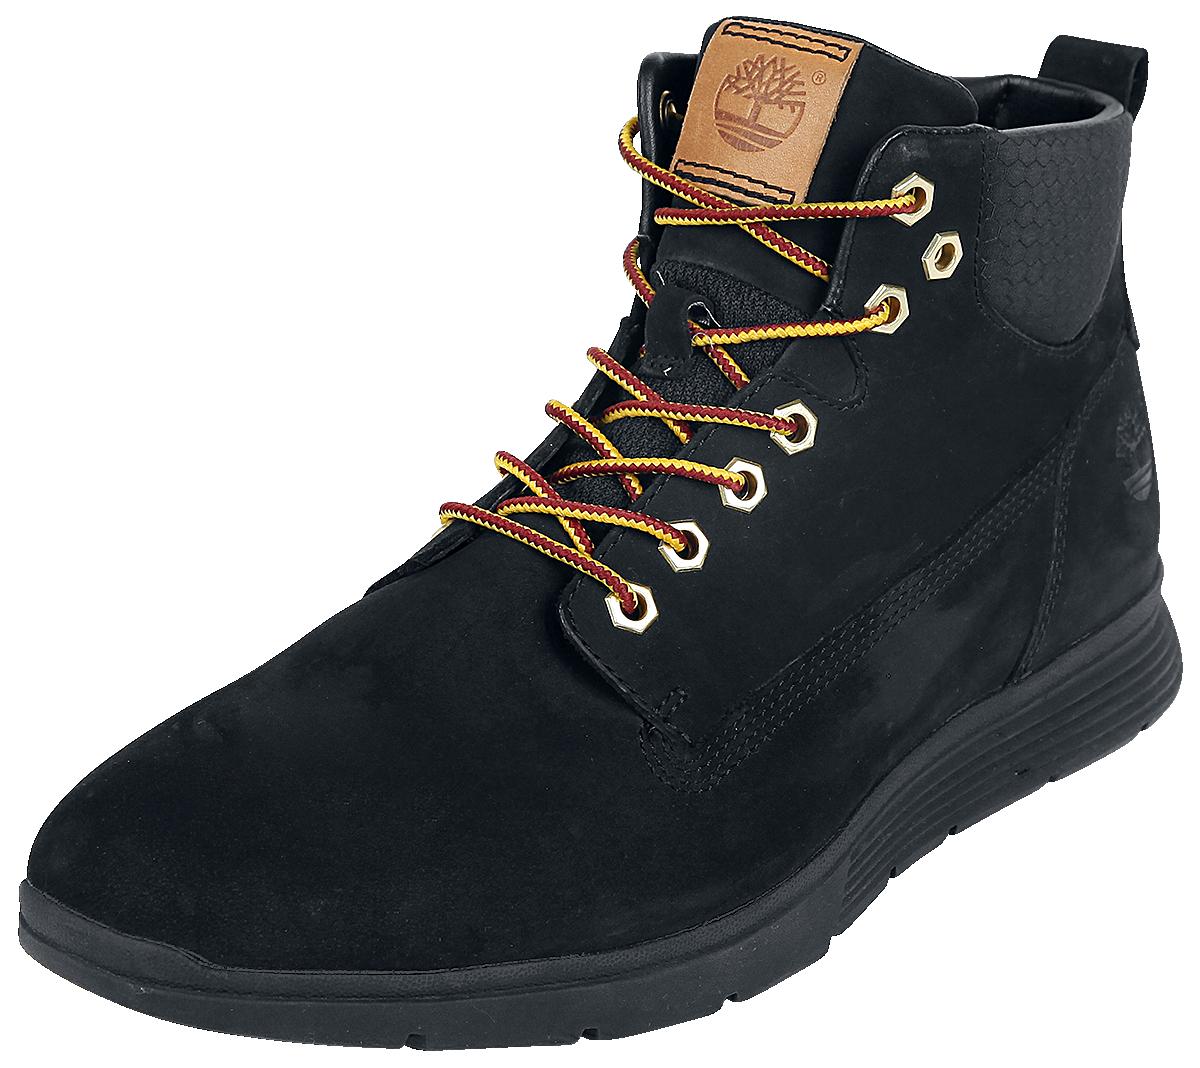 Timberland - Killington Chukka Sensorflex Black Nubuck - Sneakers - black image